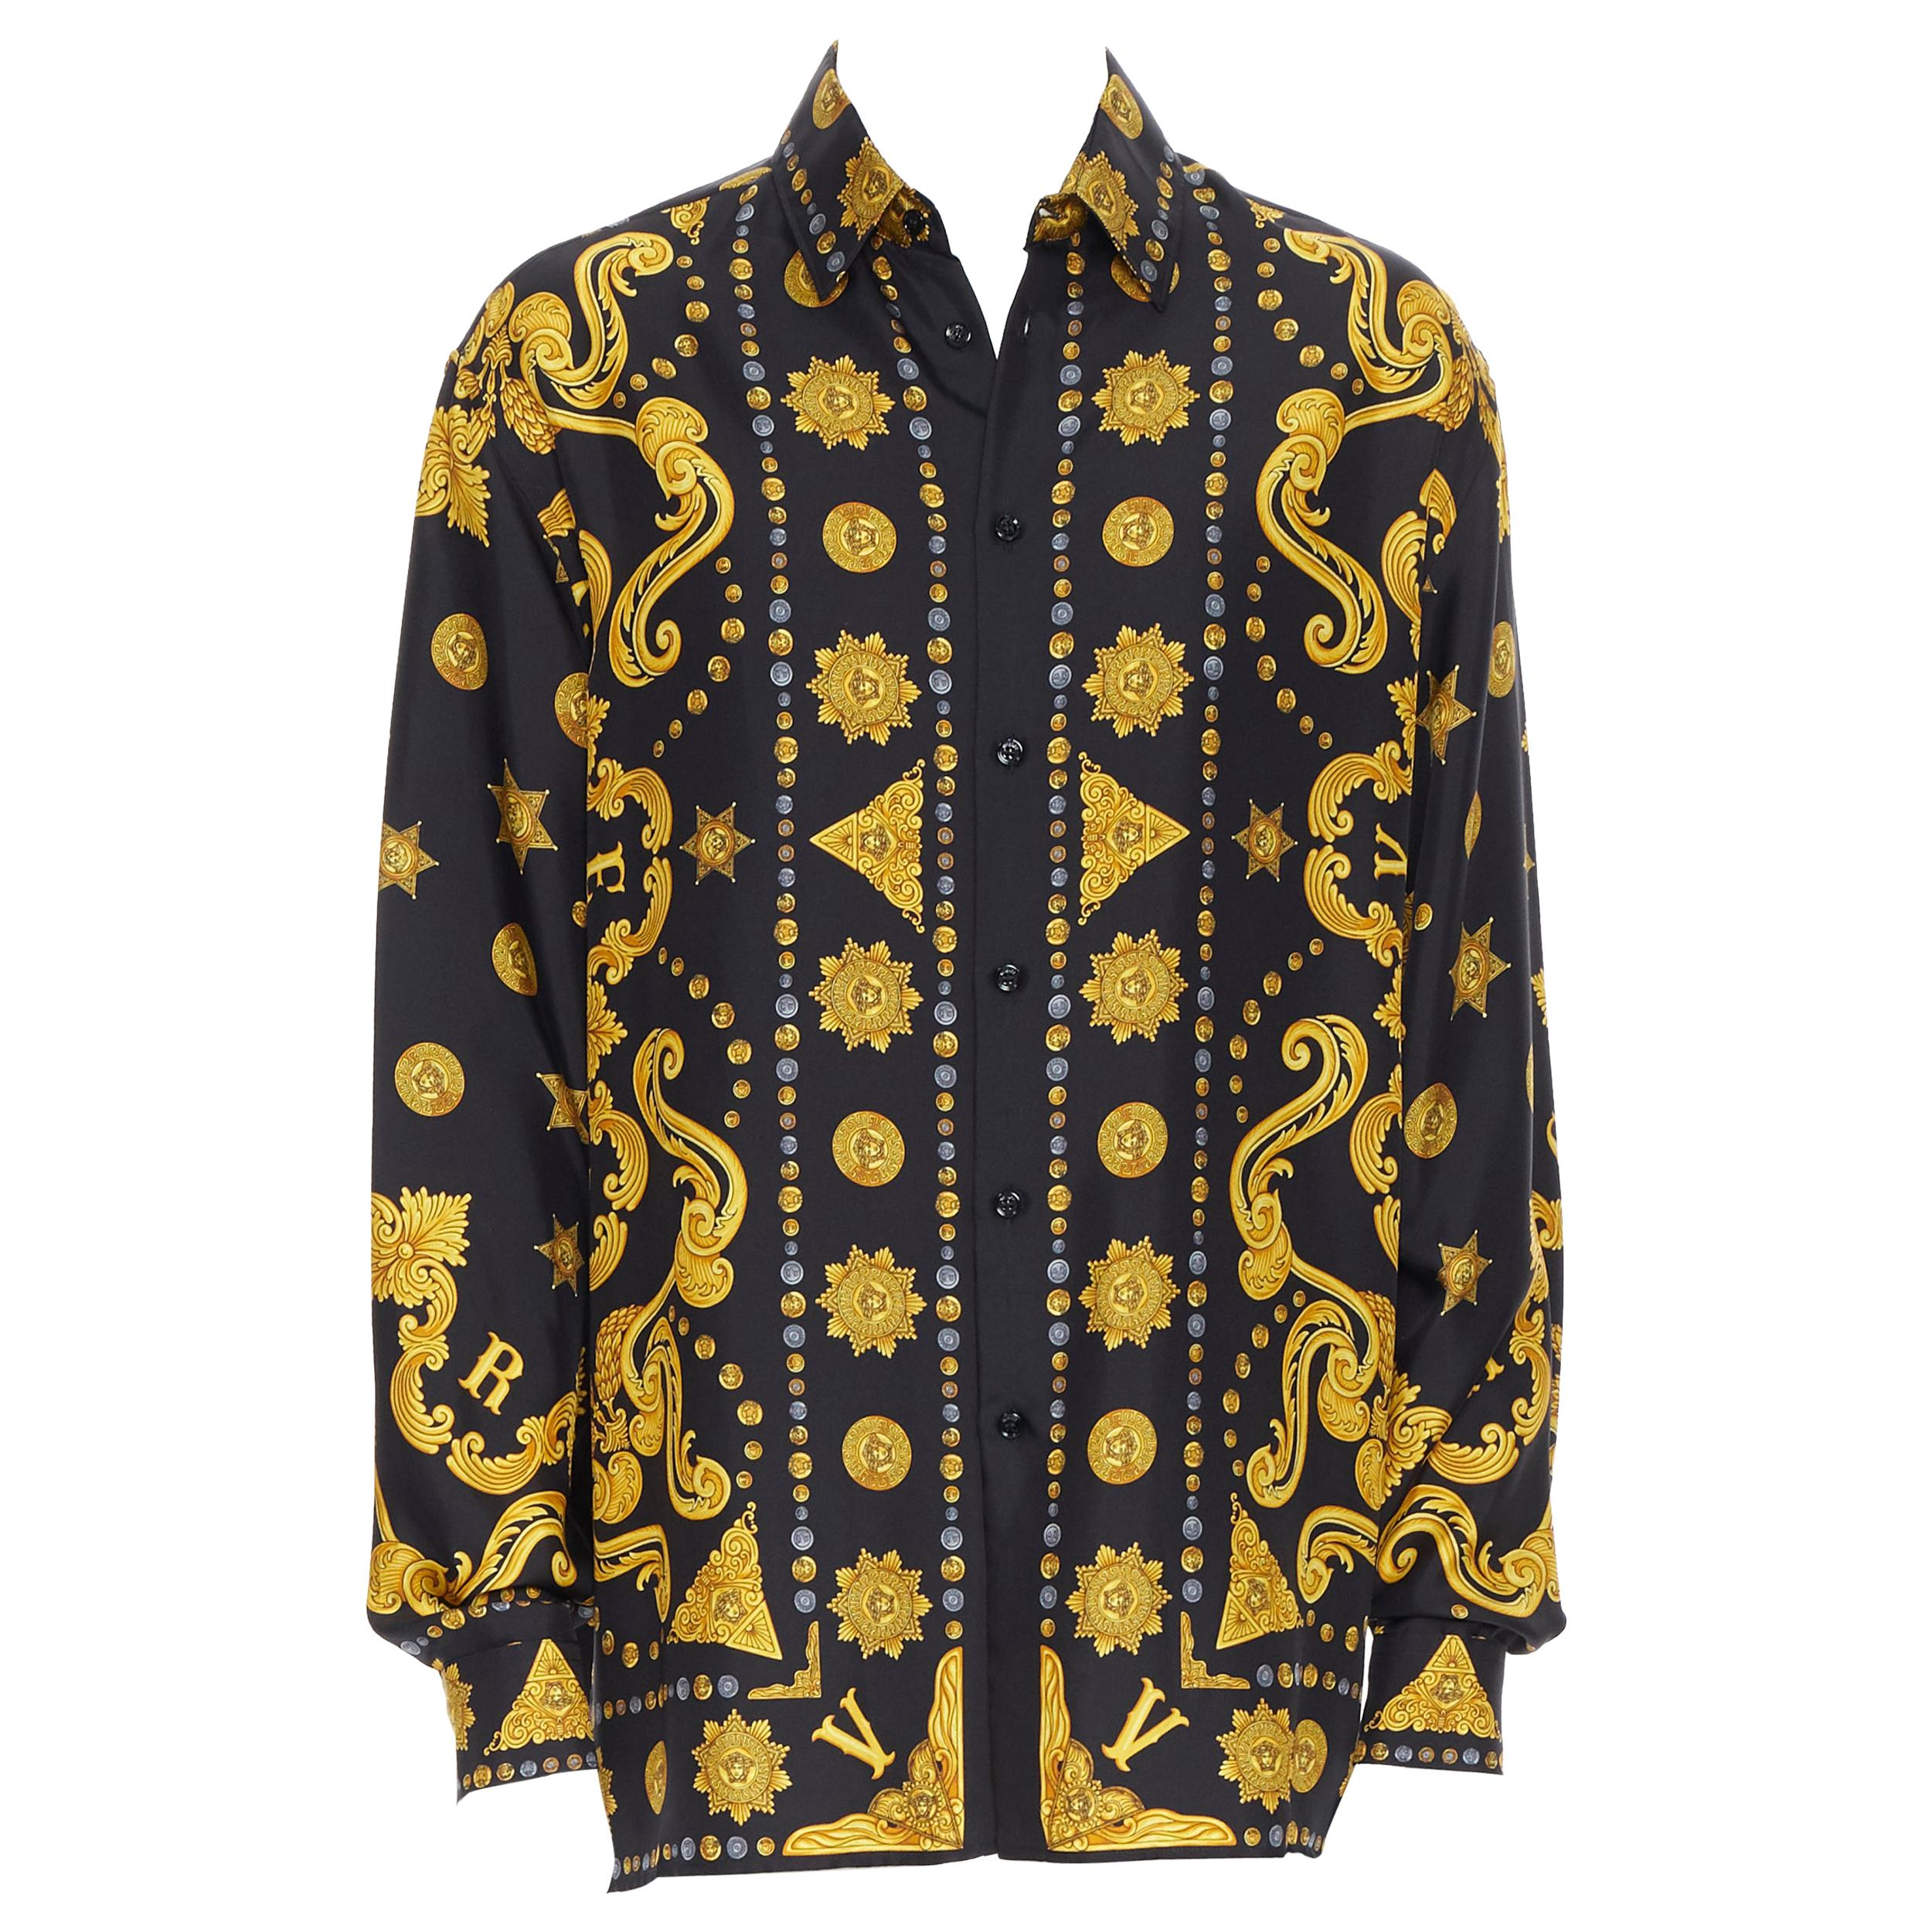 new VERSACE black gold Medusa coin western star baroque print silk shirt EU41 L